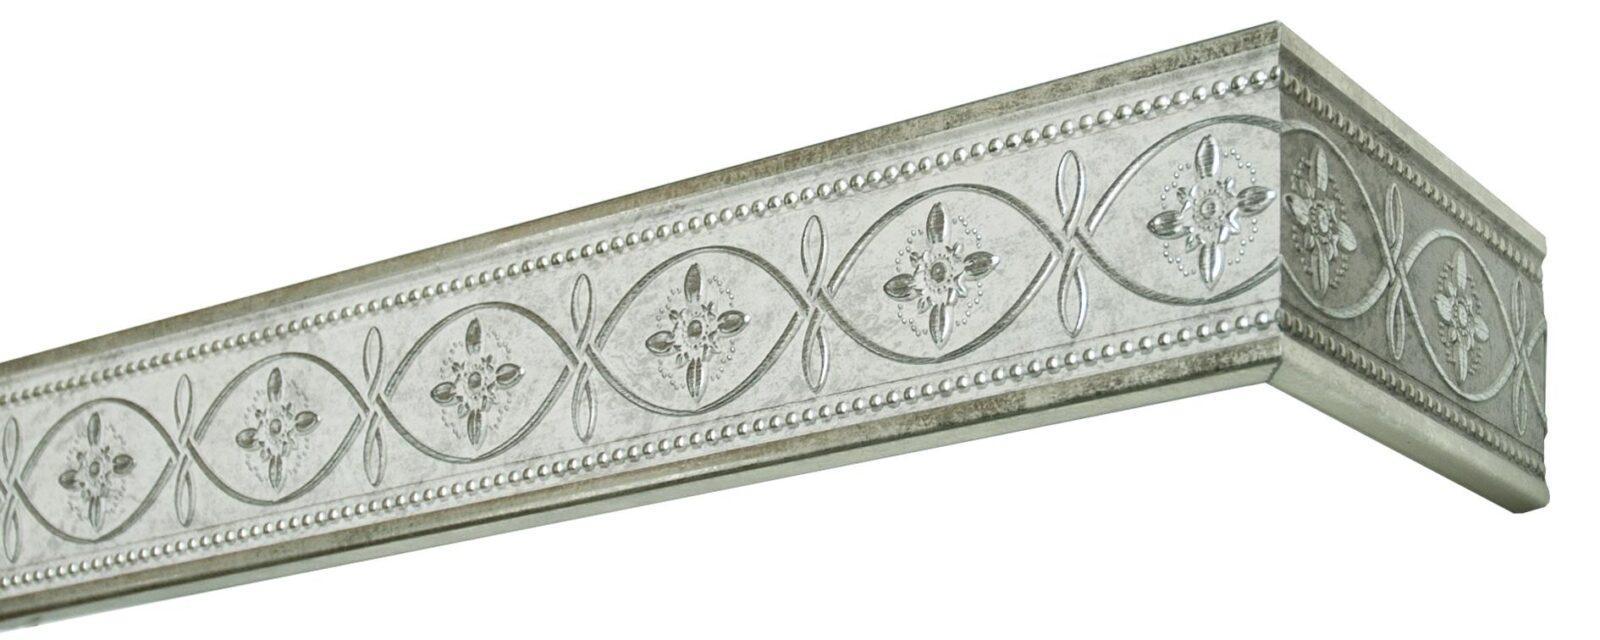 Комплект боковин Унисон античное серебро 80 мм